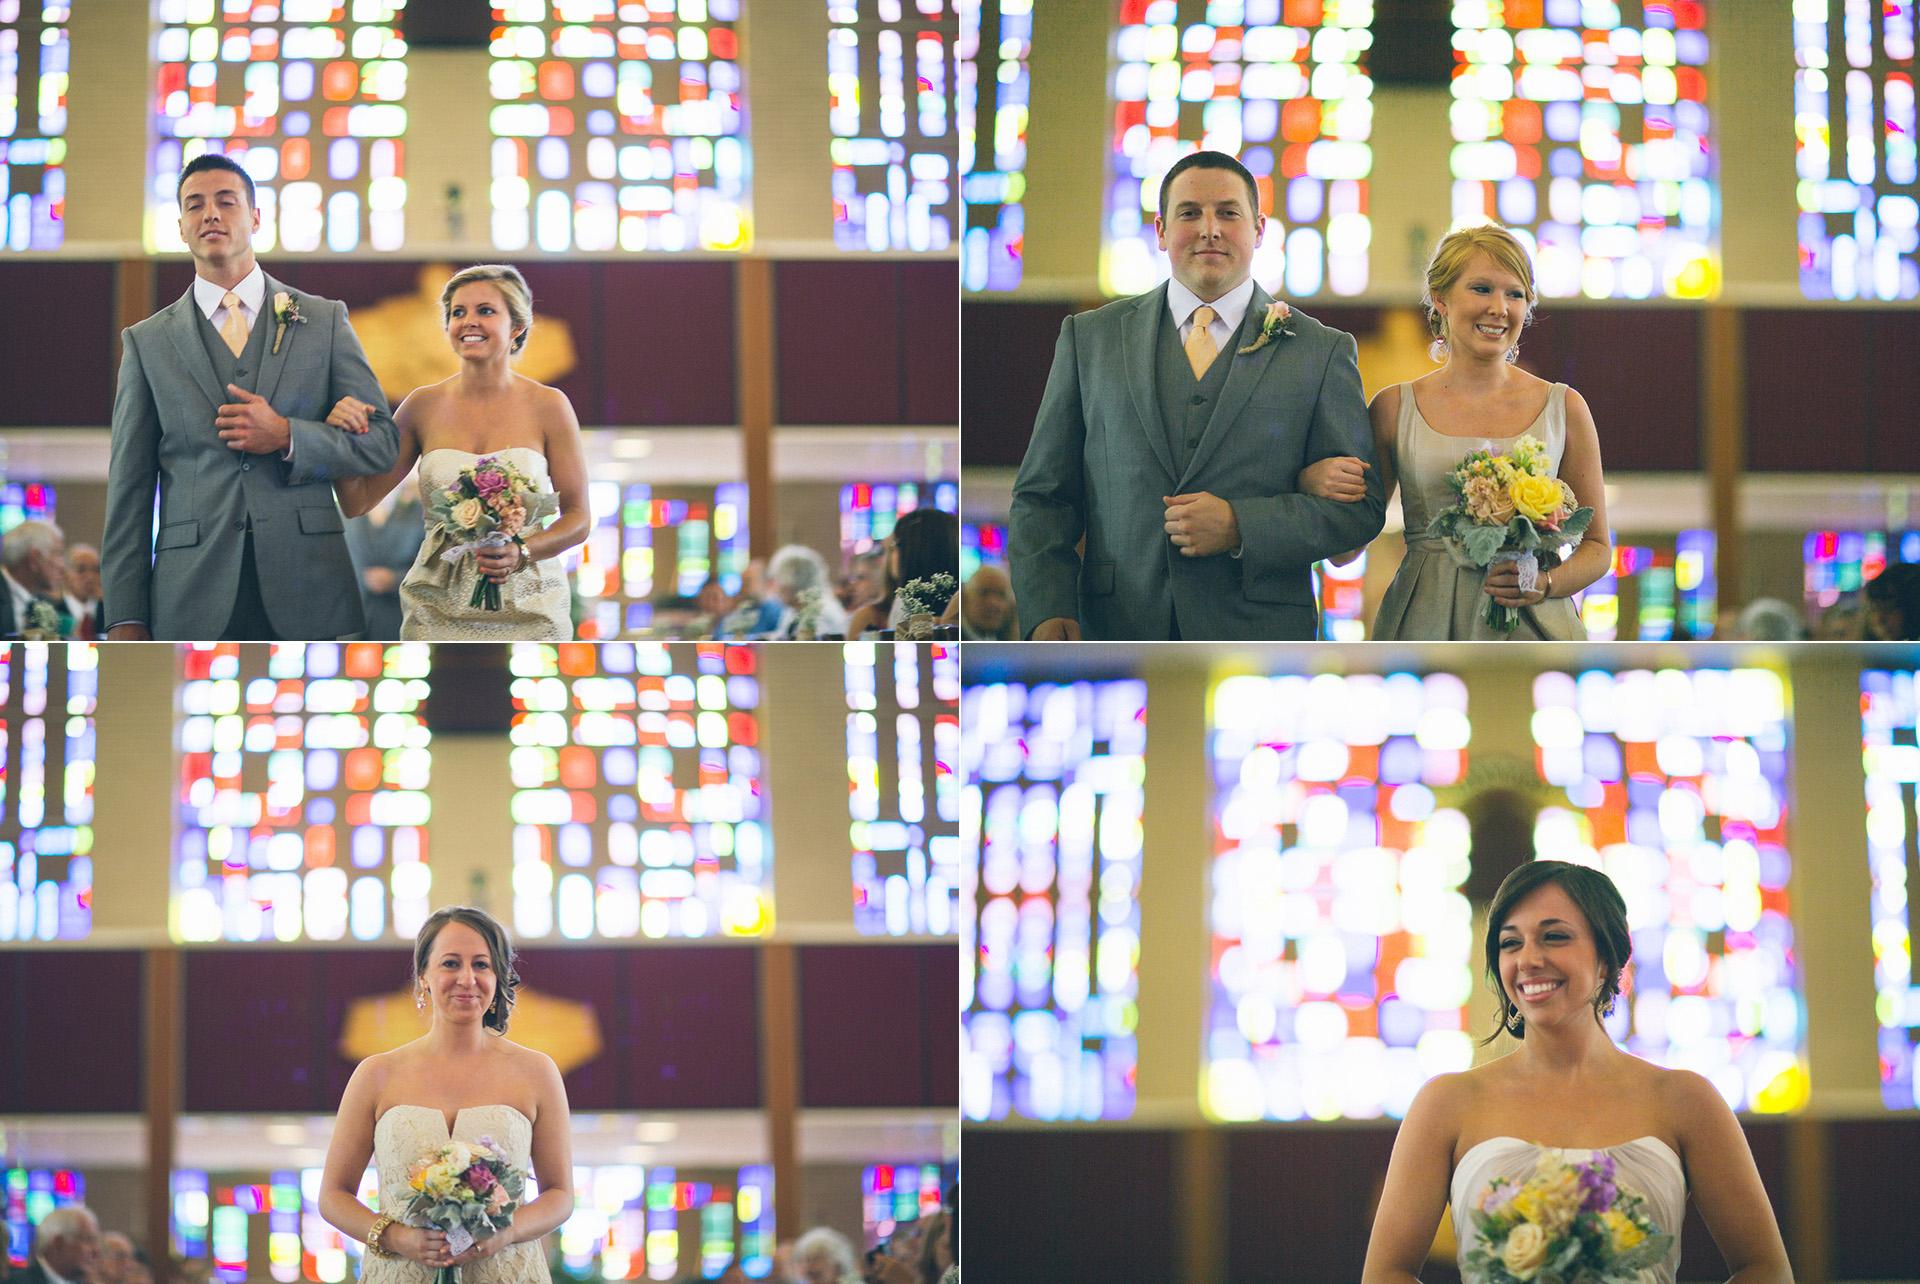 Ariel International Center Wedding Photos 16.jpg